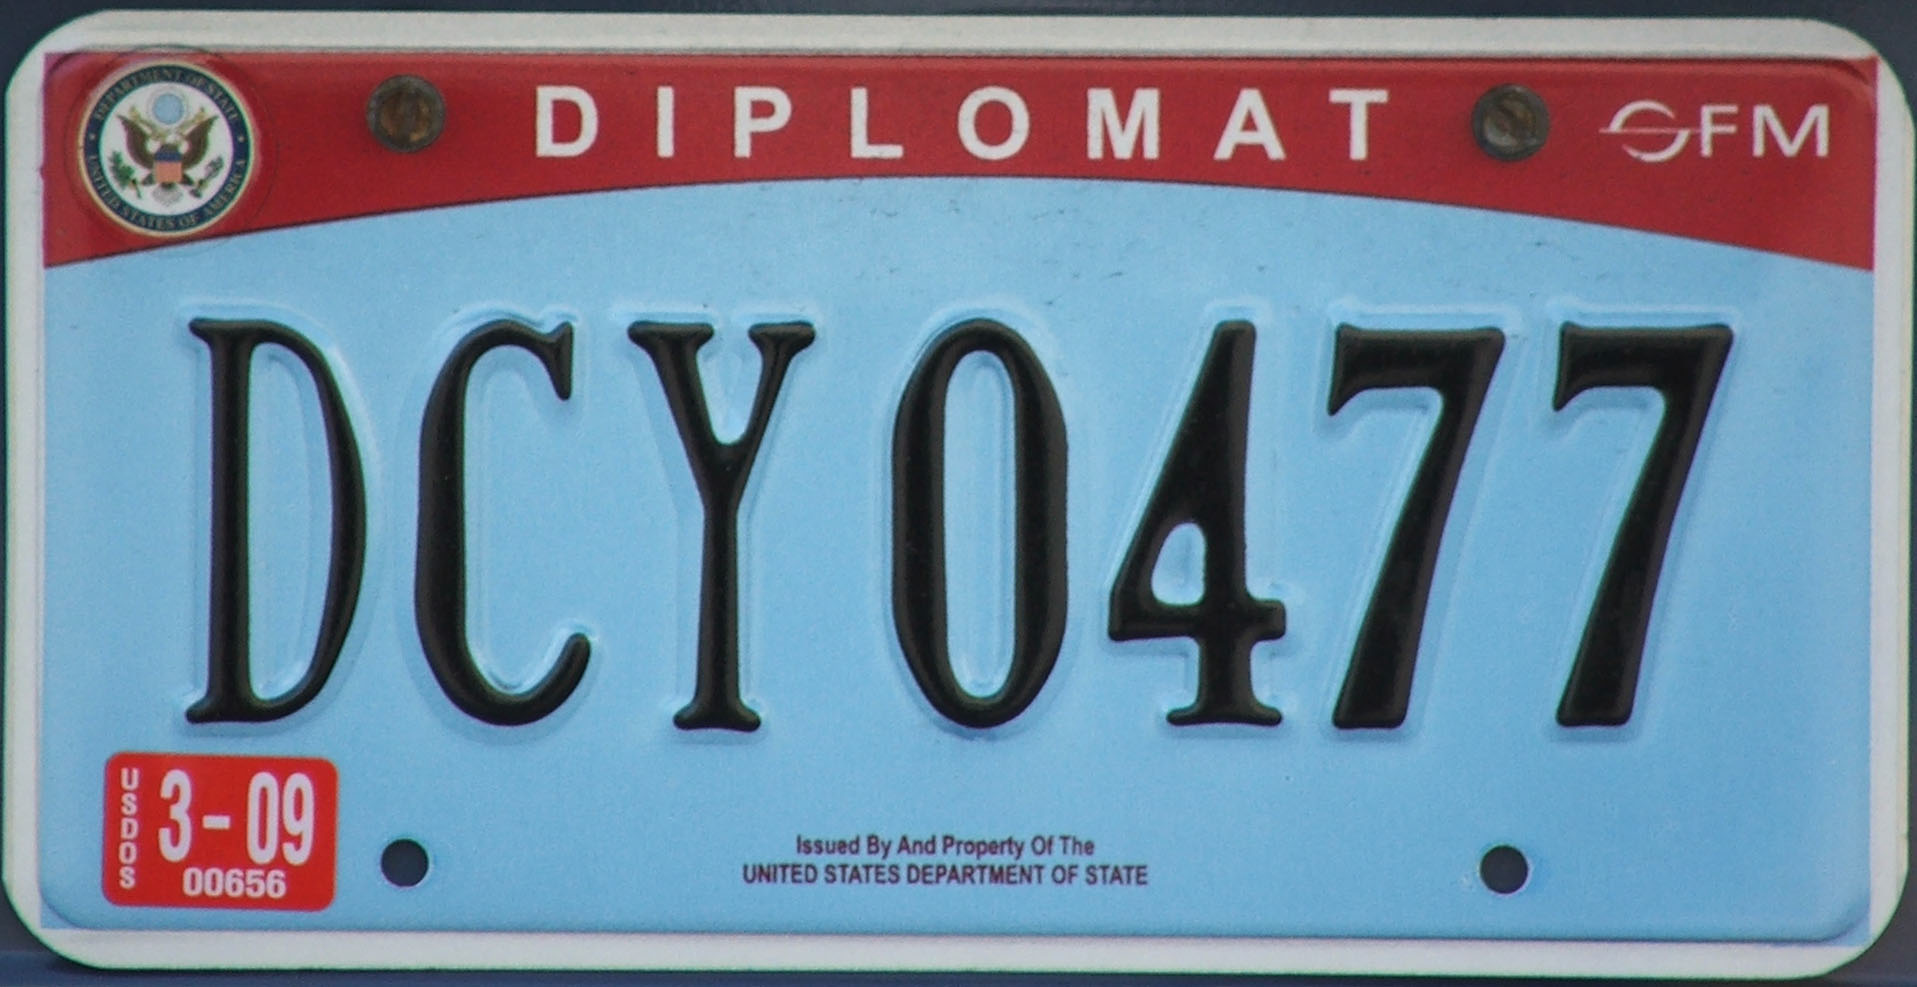 f1096fa7f2c Diplomatic vehicle registration plate - Wikipedia